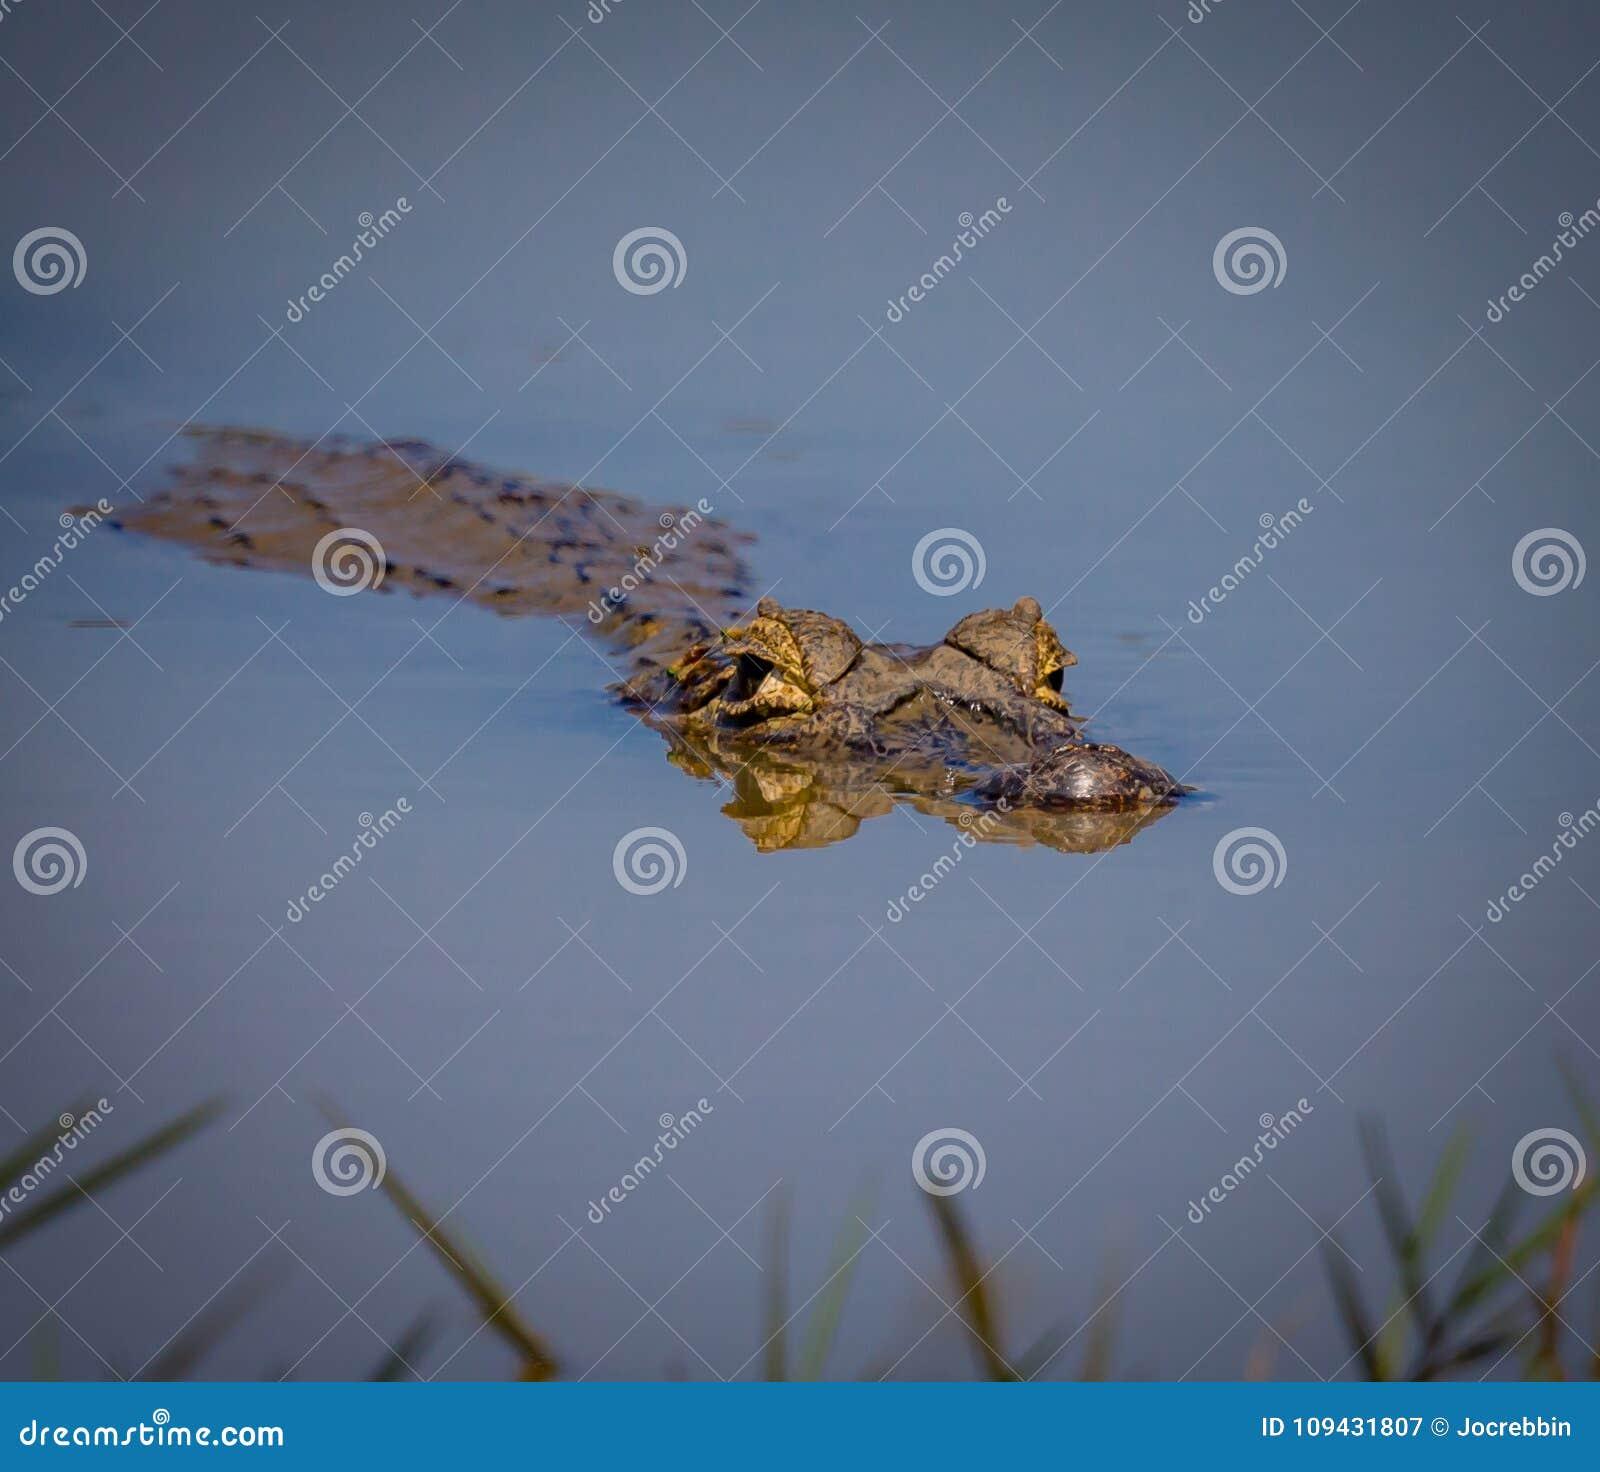 Caimán que flota en la superficie del agua en Pantanal, el Brasil